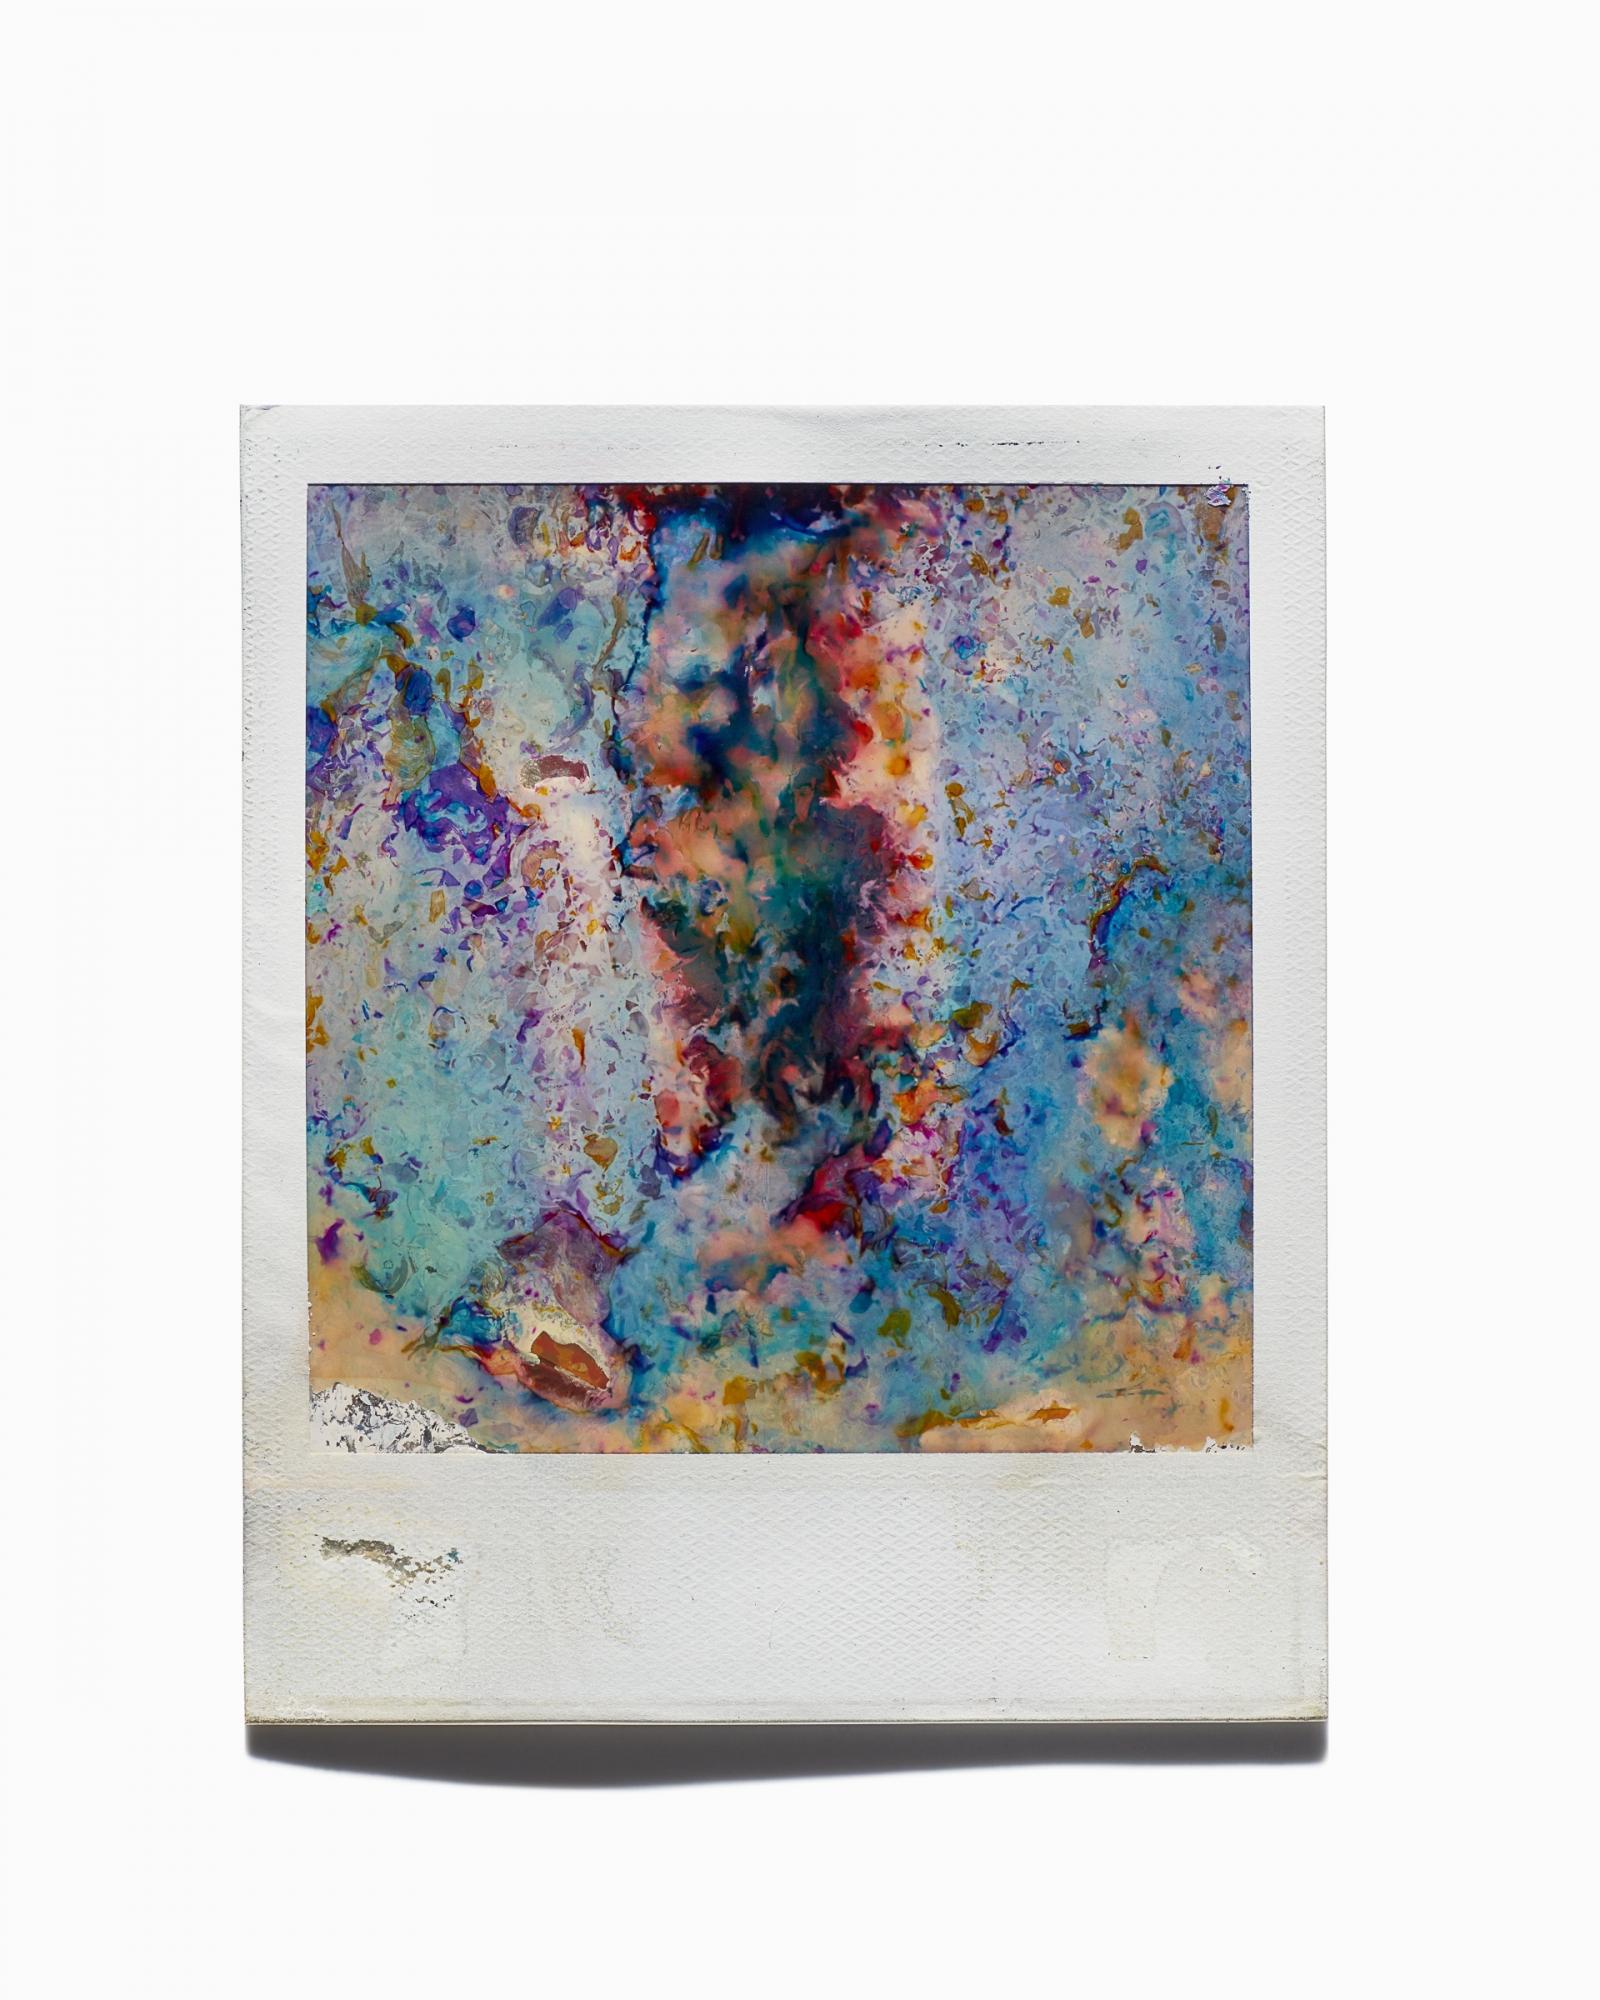 Nebula by Rob Kinghorn